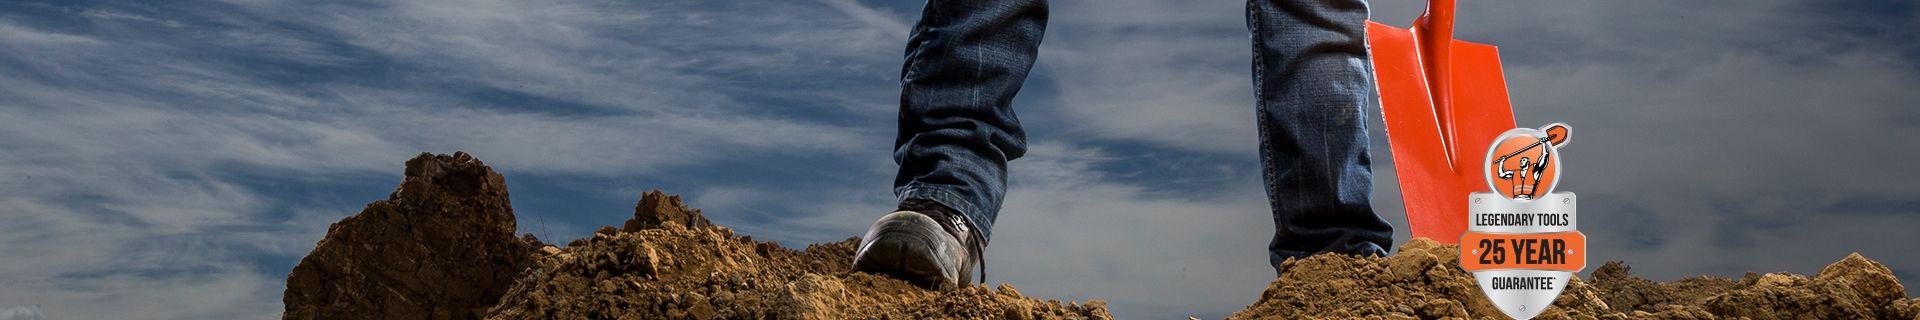 Tradie standing on pile of dirt.